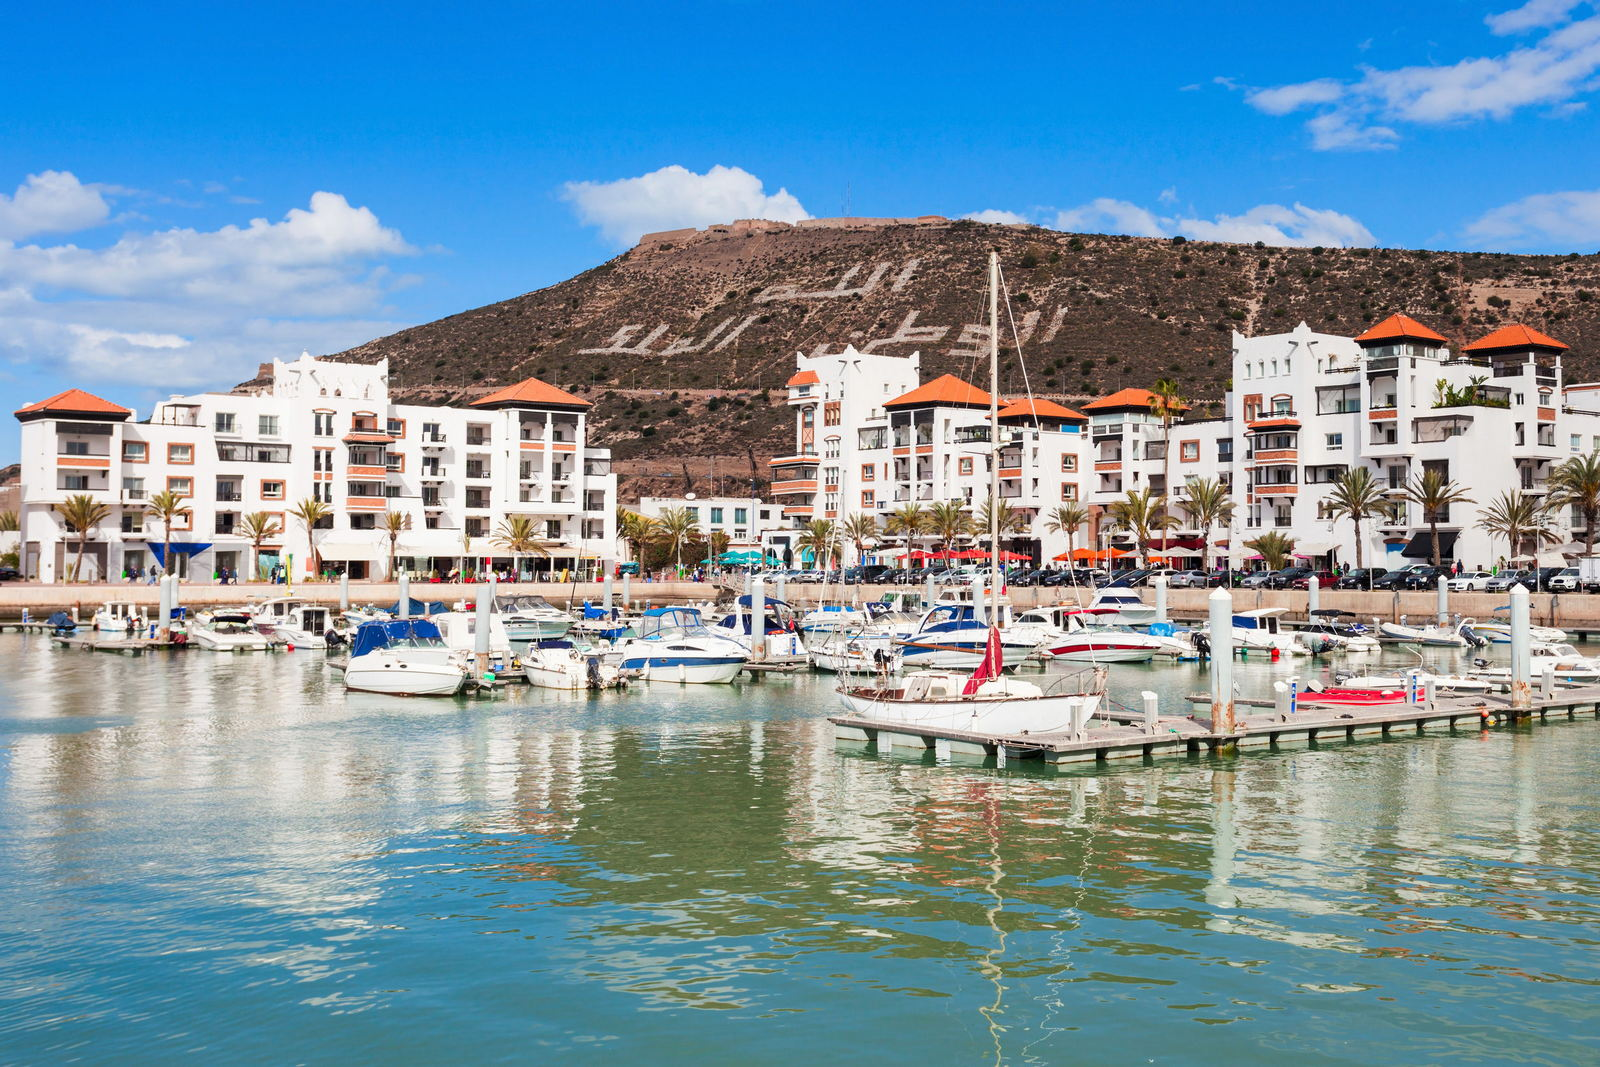 Miasto Agadir w Maroku